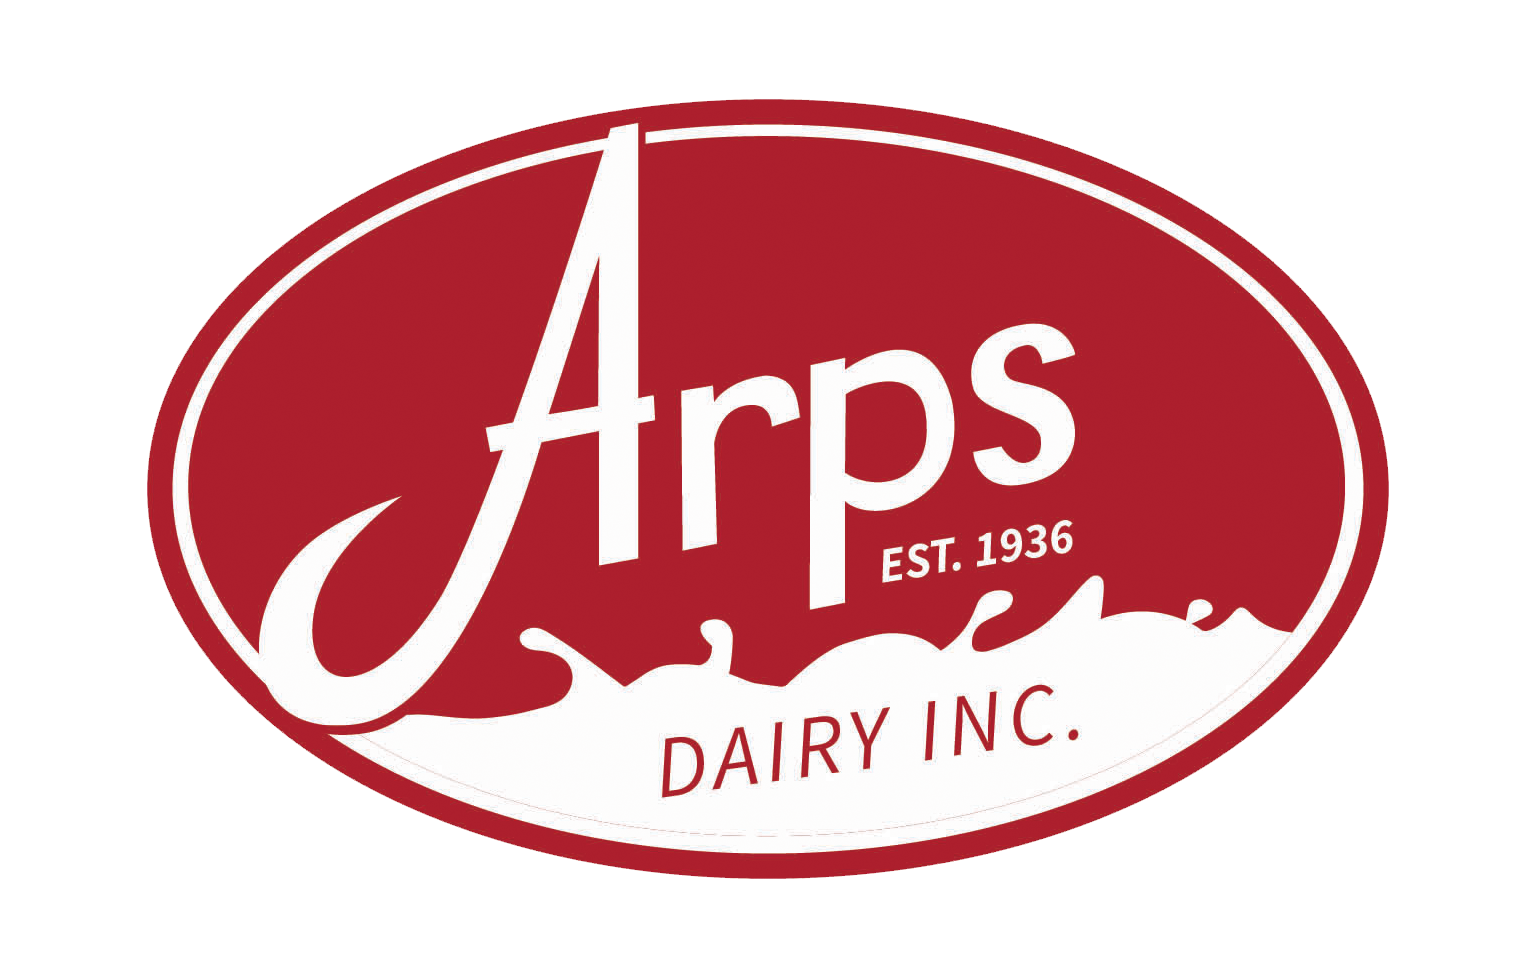 Arps Dairy